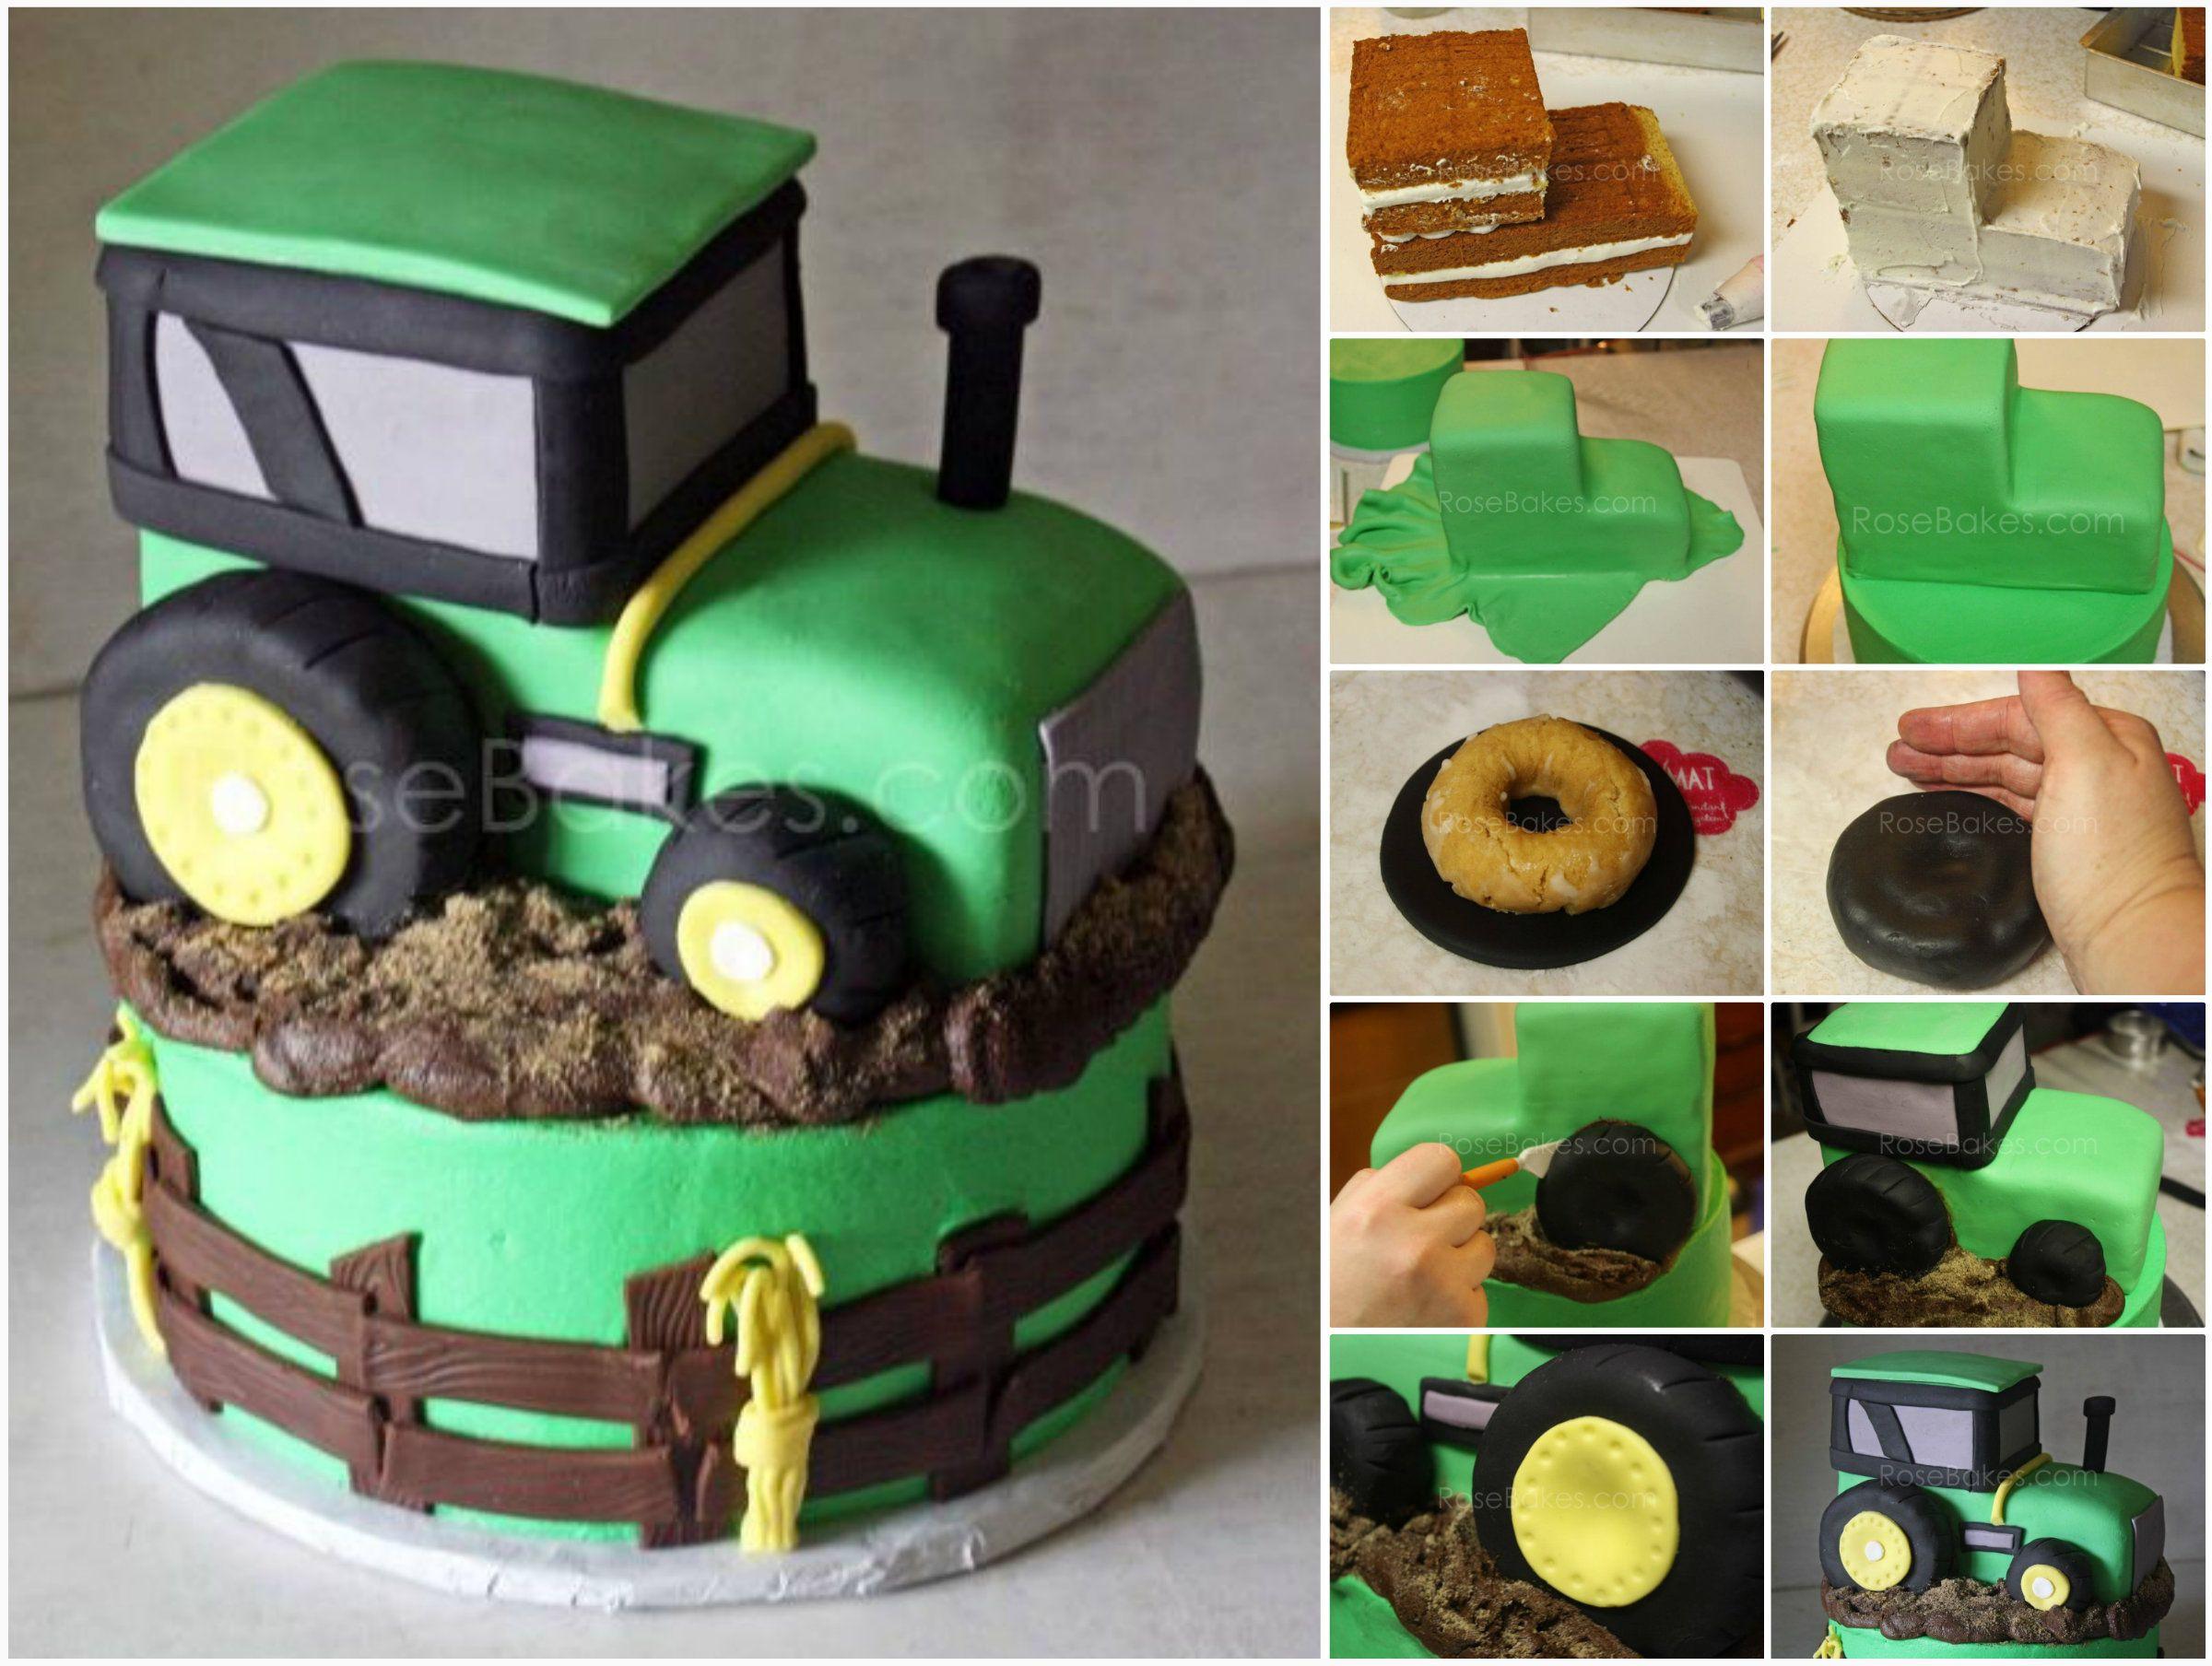 Geburtstagskuchen Traktor  John Deere Tractor Cake Tutorial Easy Video Instructions